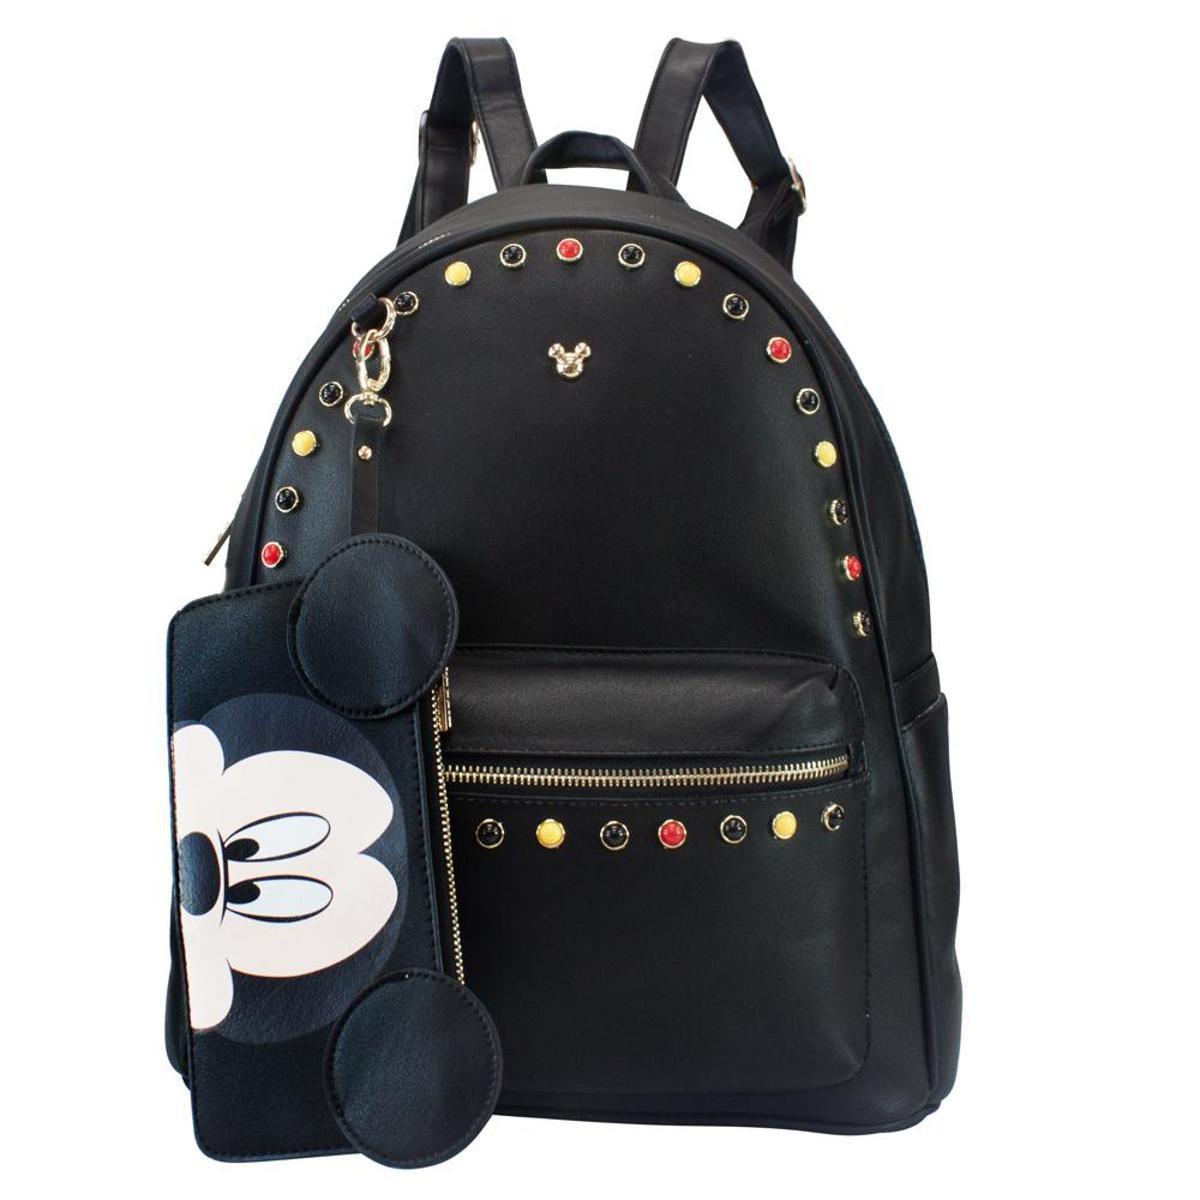 Mickey Mochila Agora Mouse Zattini Bolsa Compre BMK78333 Bq5wT